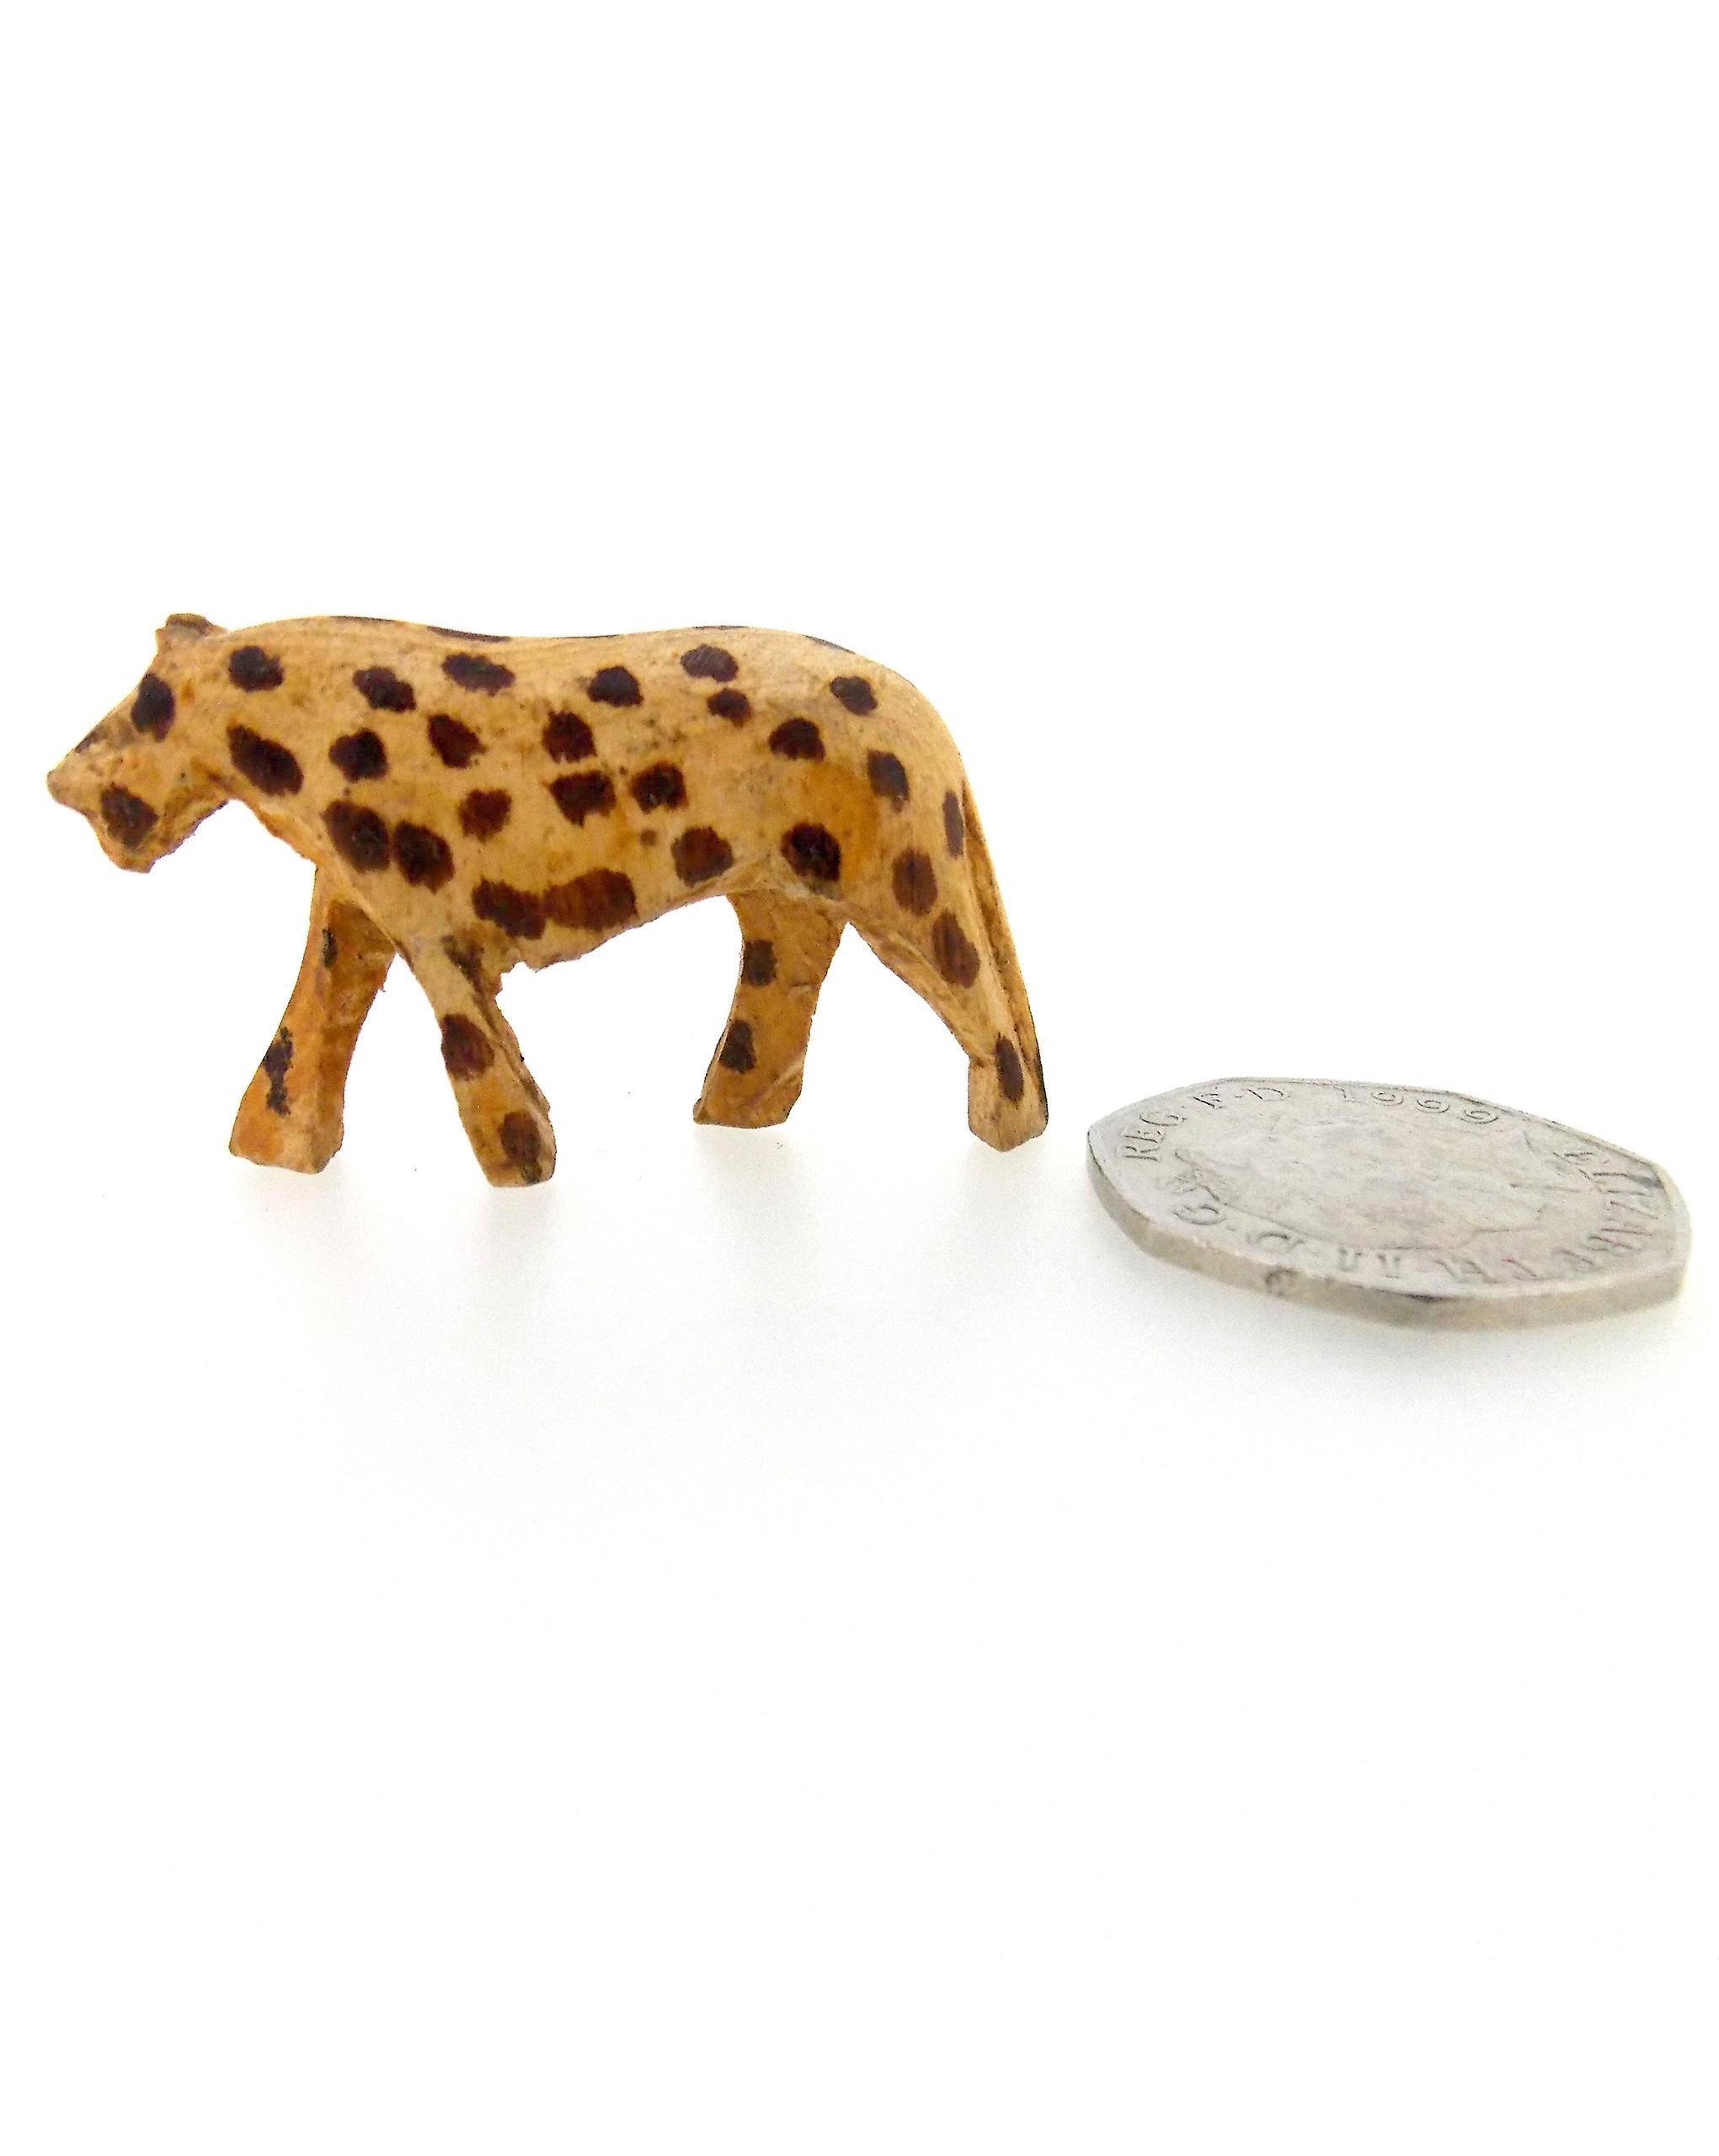 Vintage Wooden Leopard Figurine Family - 4 Piece Set